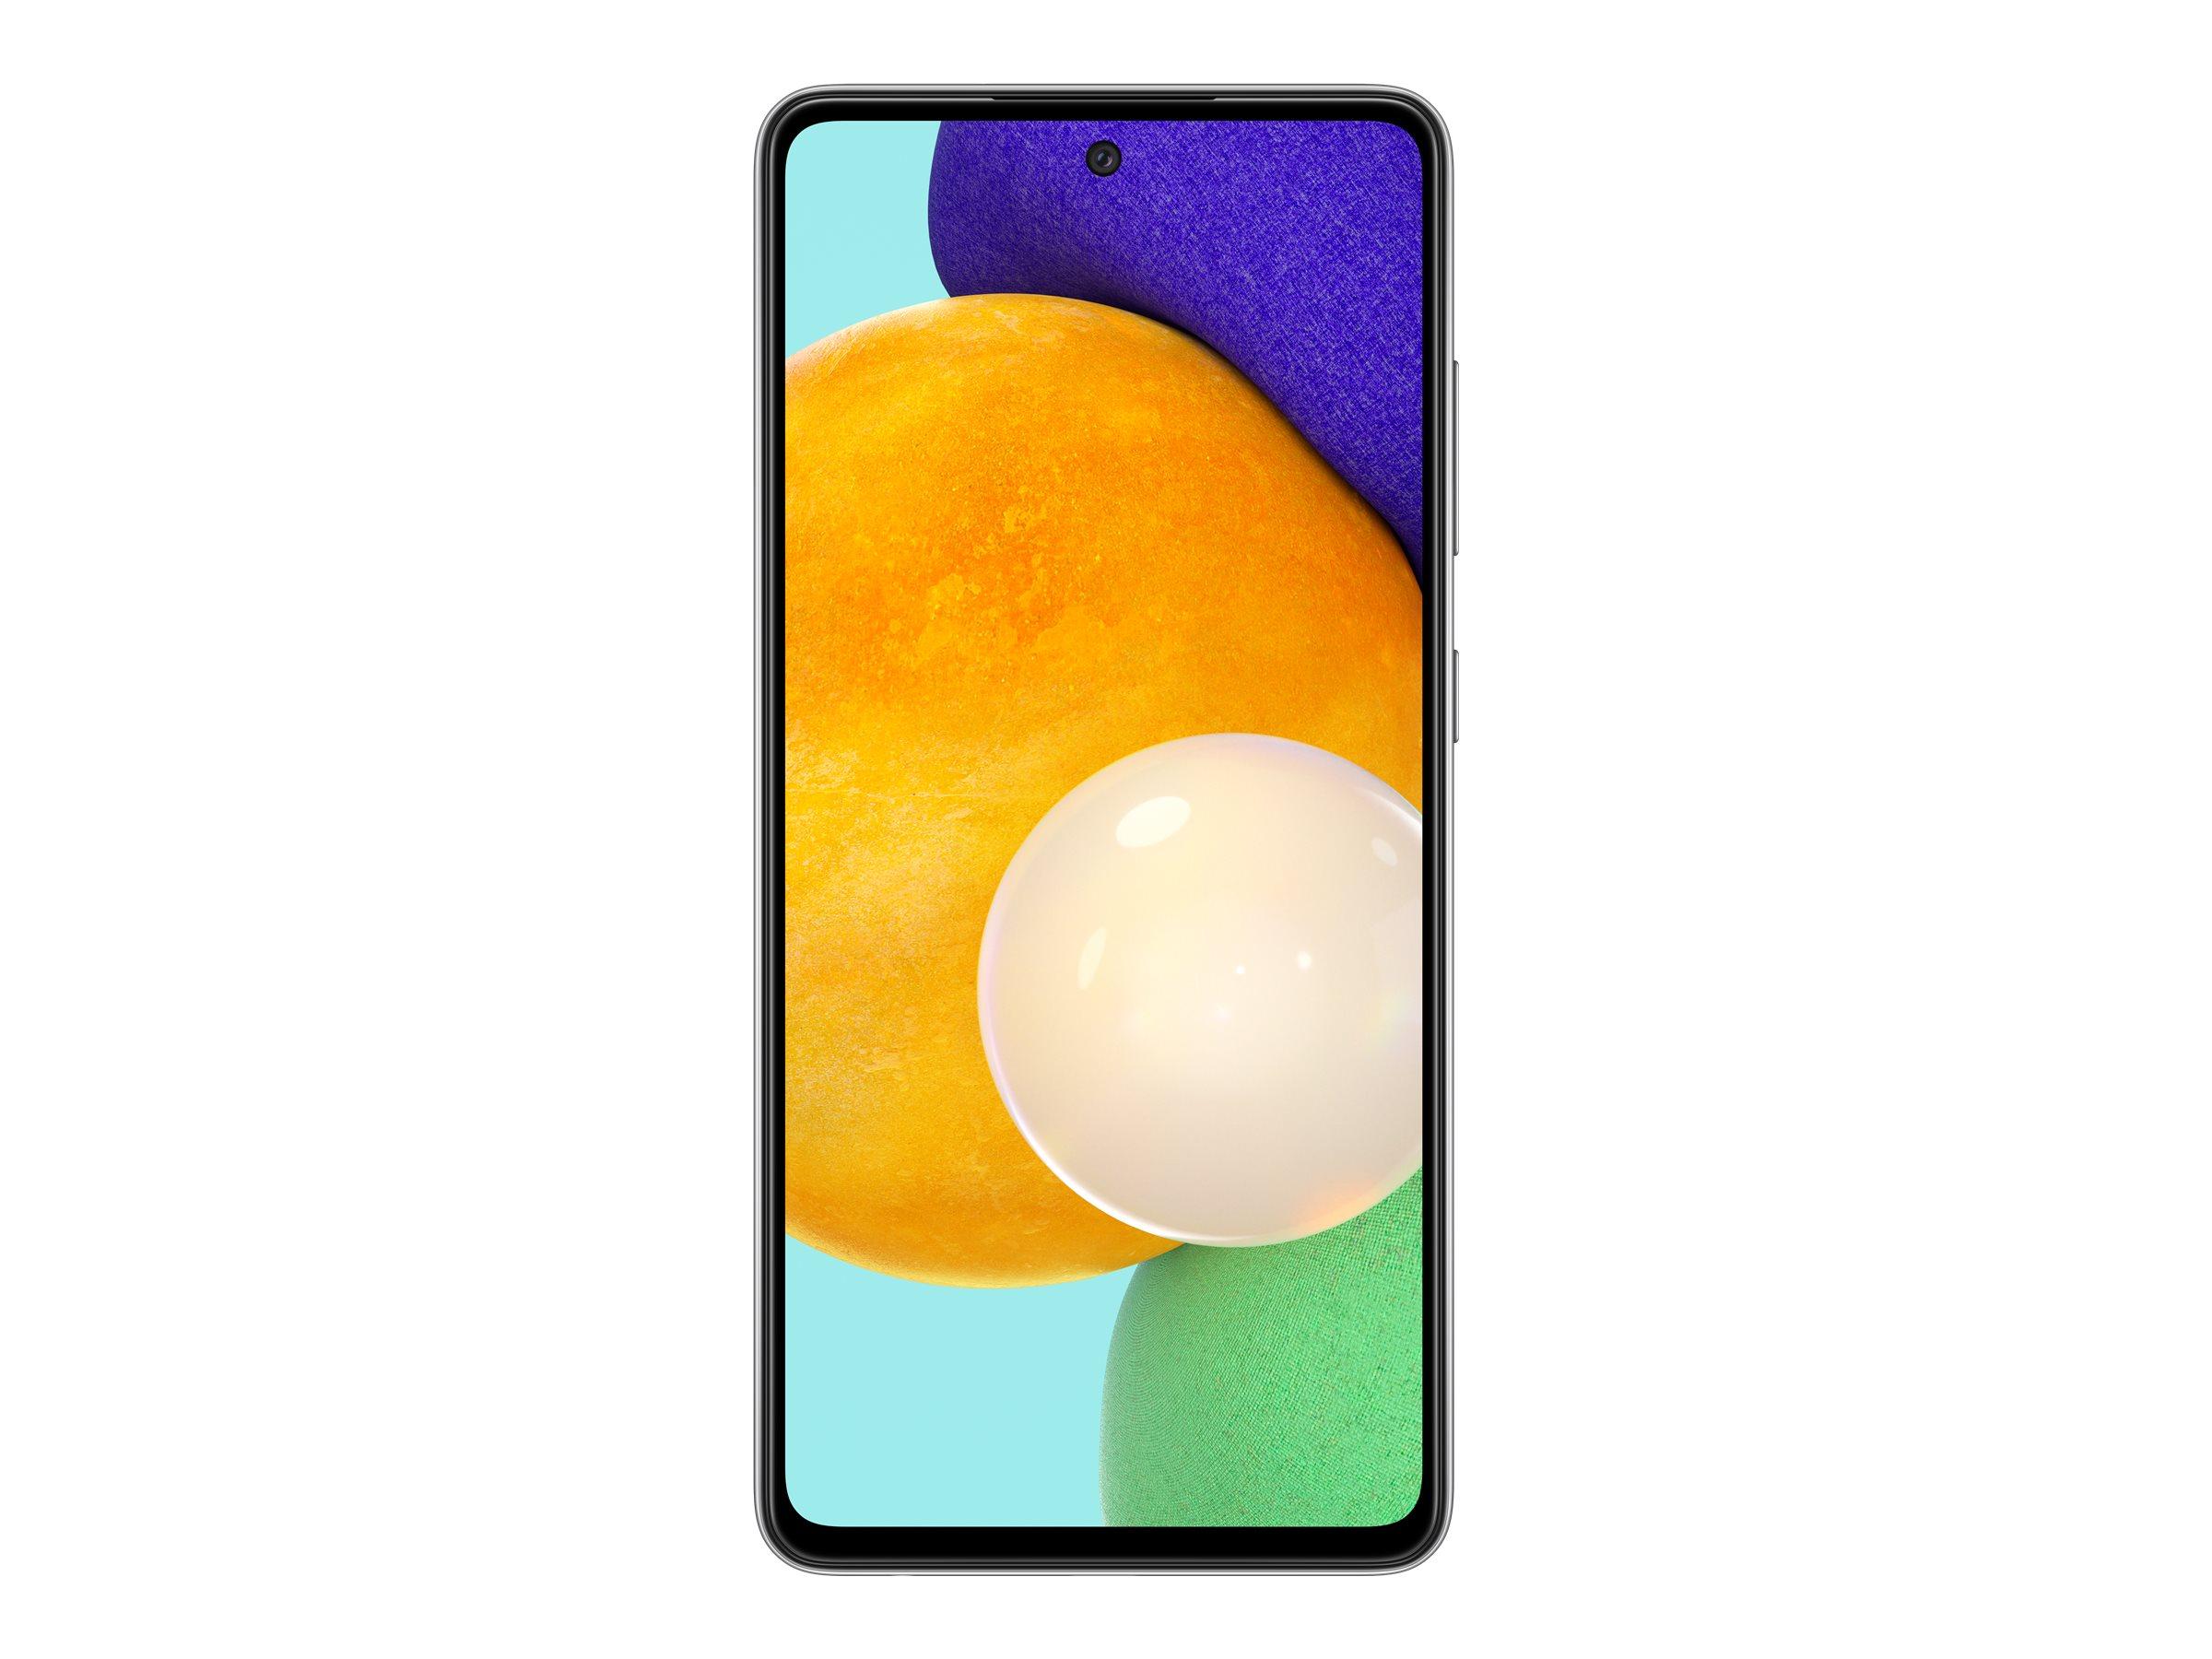 "Vorschau: Samsung Galaxy A52 5G - Smartphone - Dual-SIM - 5G NR - 128 GB - microSD slot - 6.5"" - 2400 x 1080 Pixel - Super AMOLED - RAM 6 GB (32 MP Vorderkamera)"